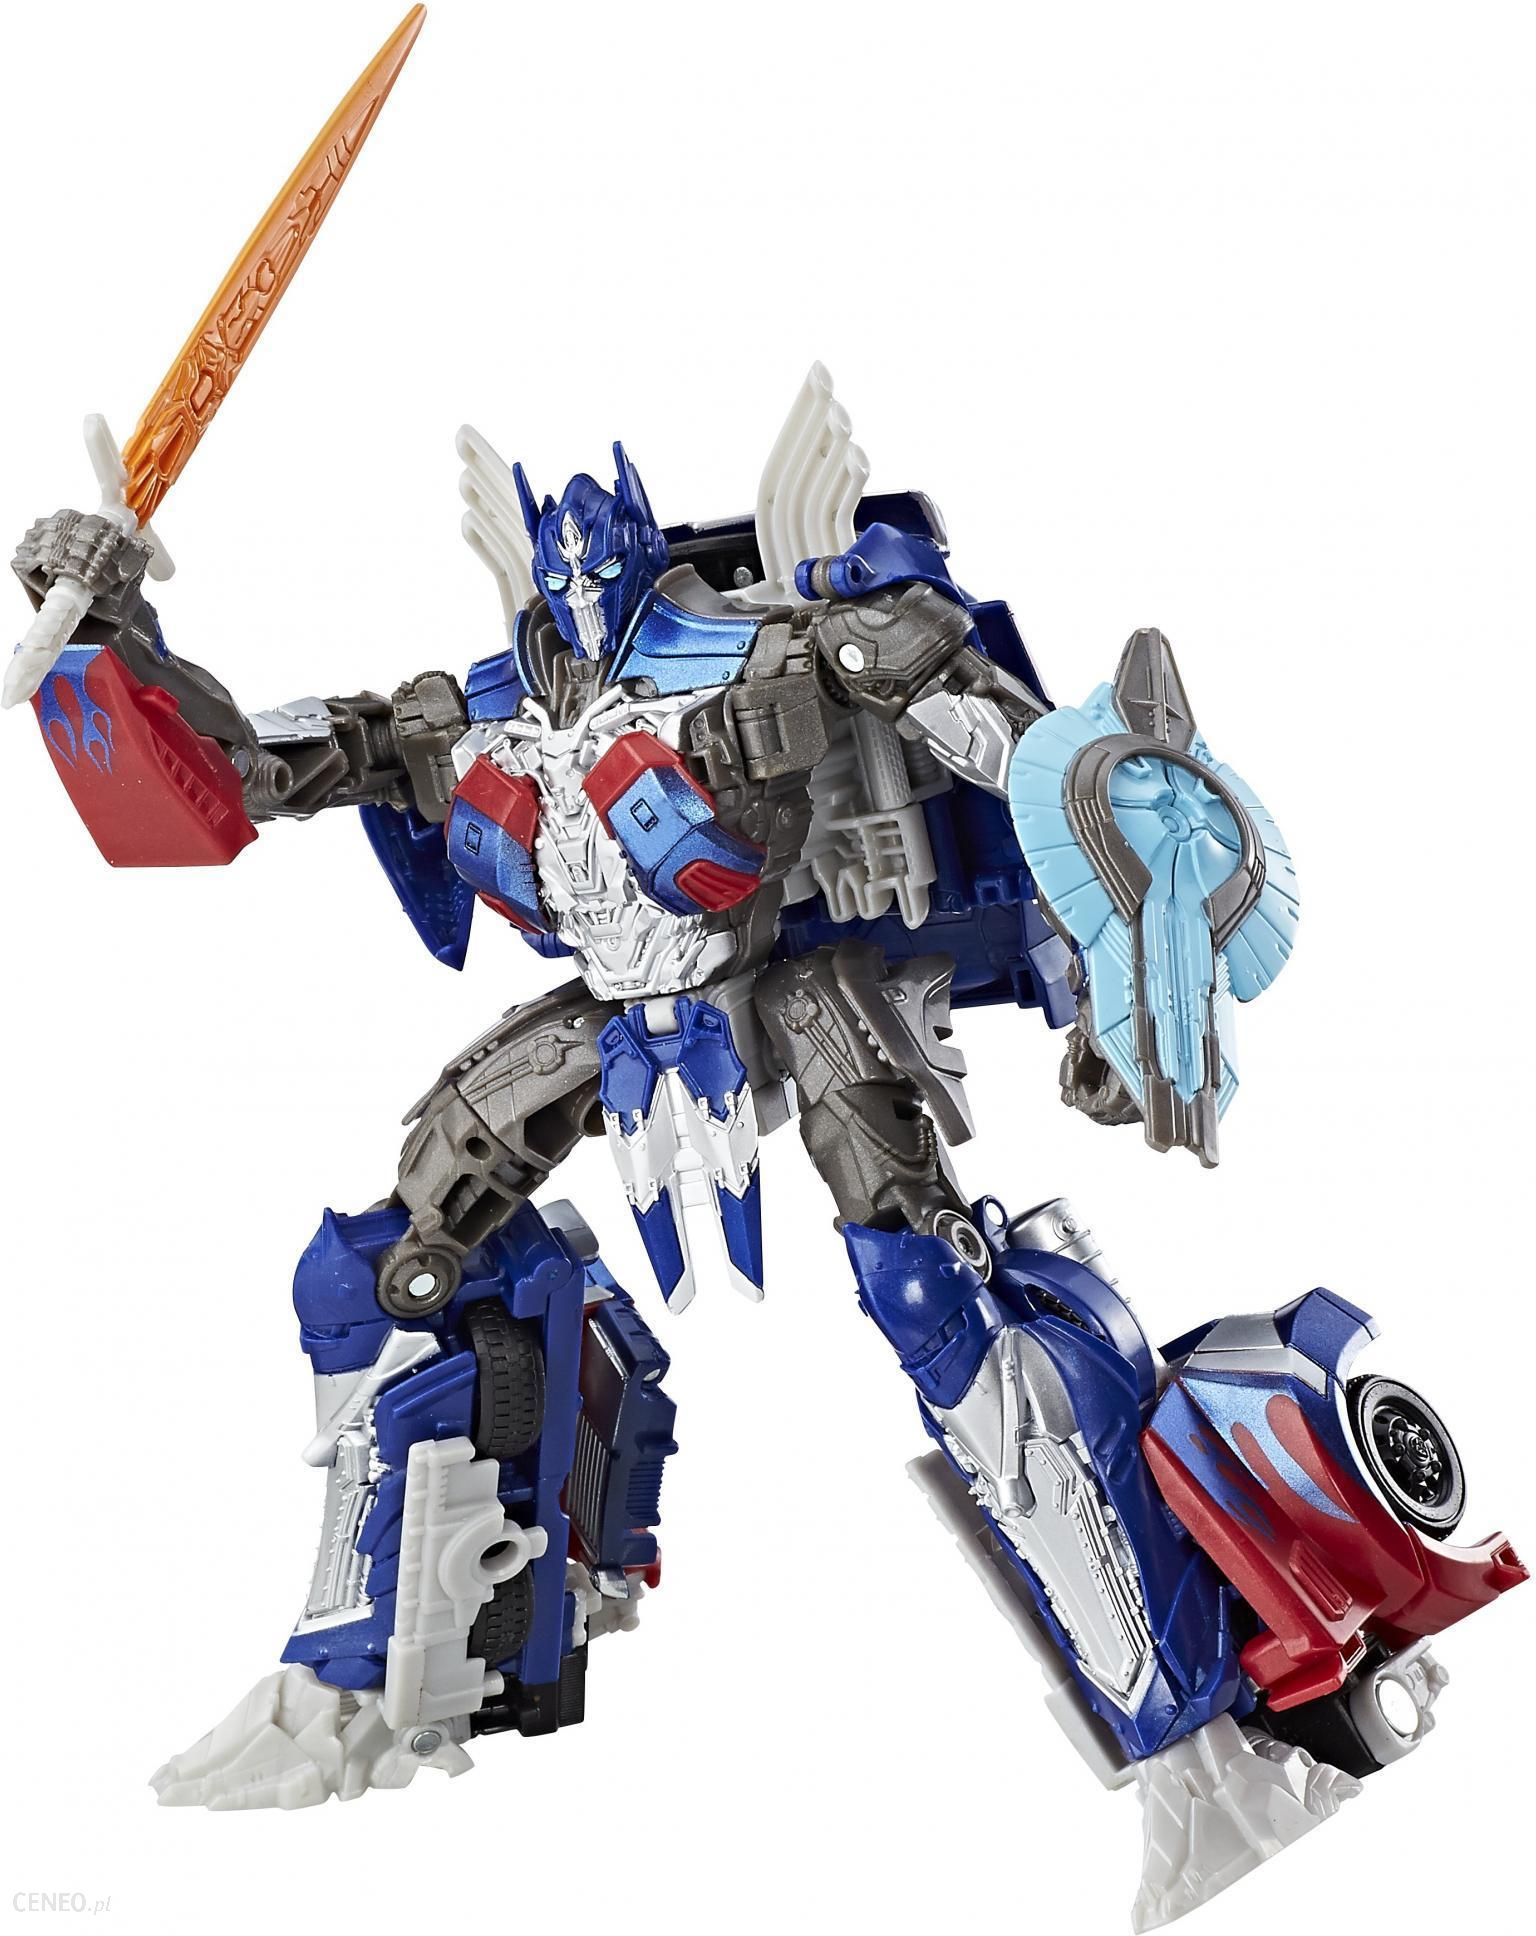 Hasbro Transformers Mv5 Voyager Optimus Prime C0891 C1334 Ceny I Opinie Ceneo Pl